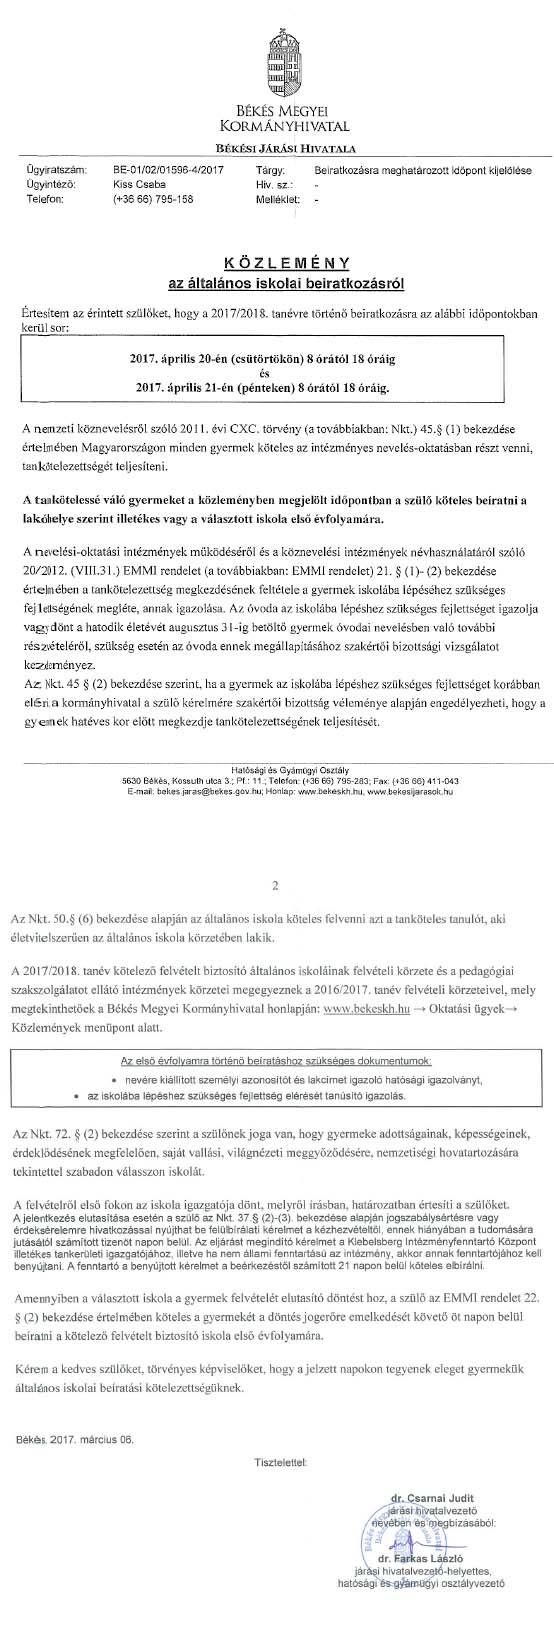 img-314140212-1